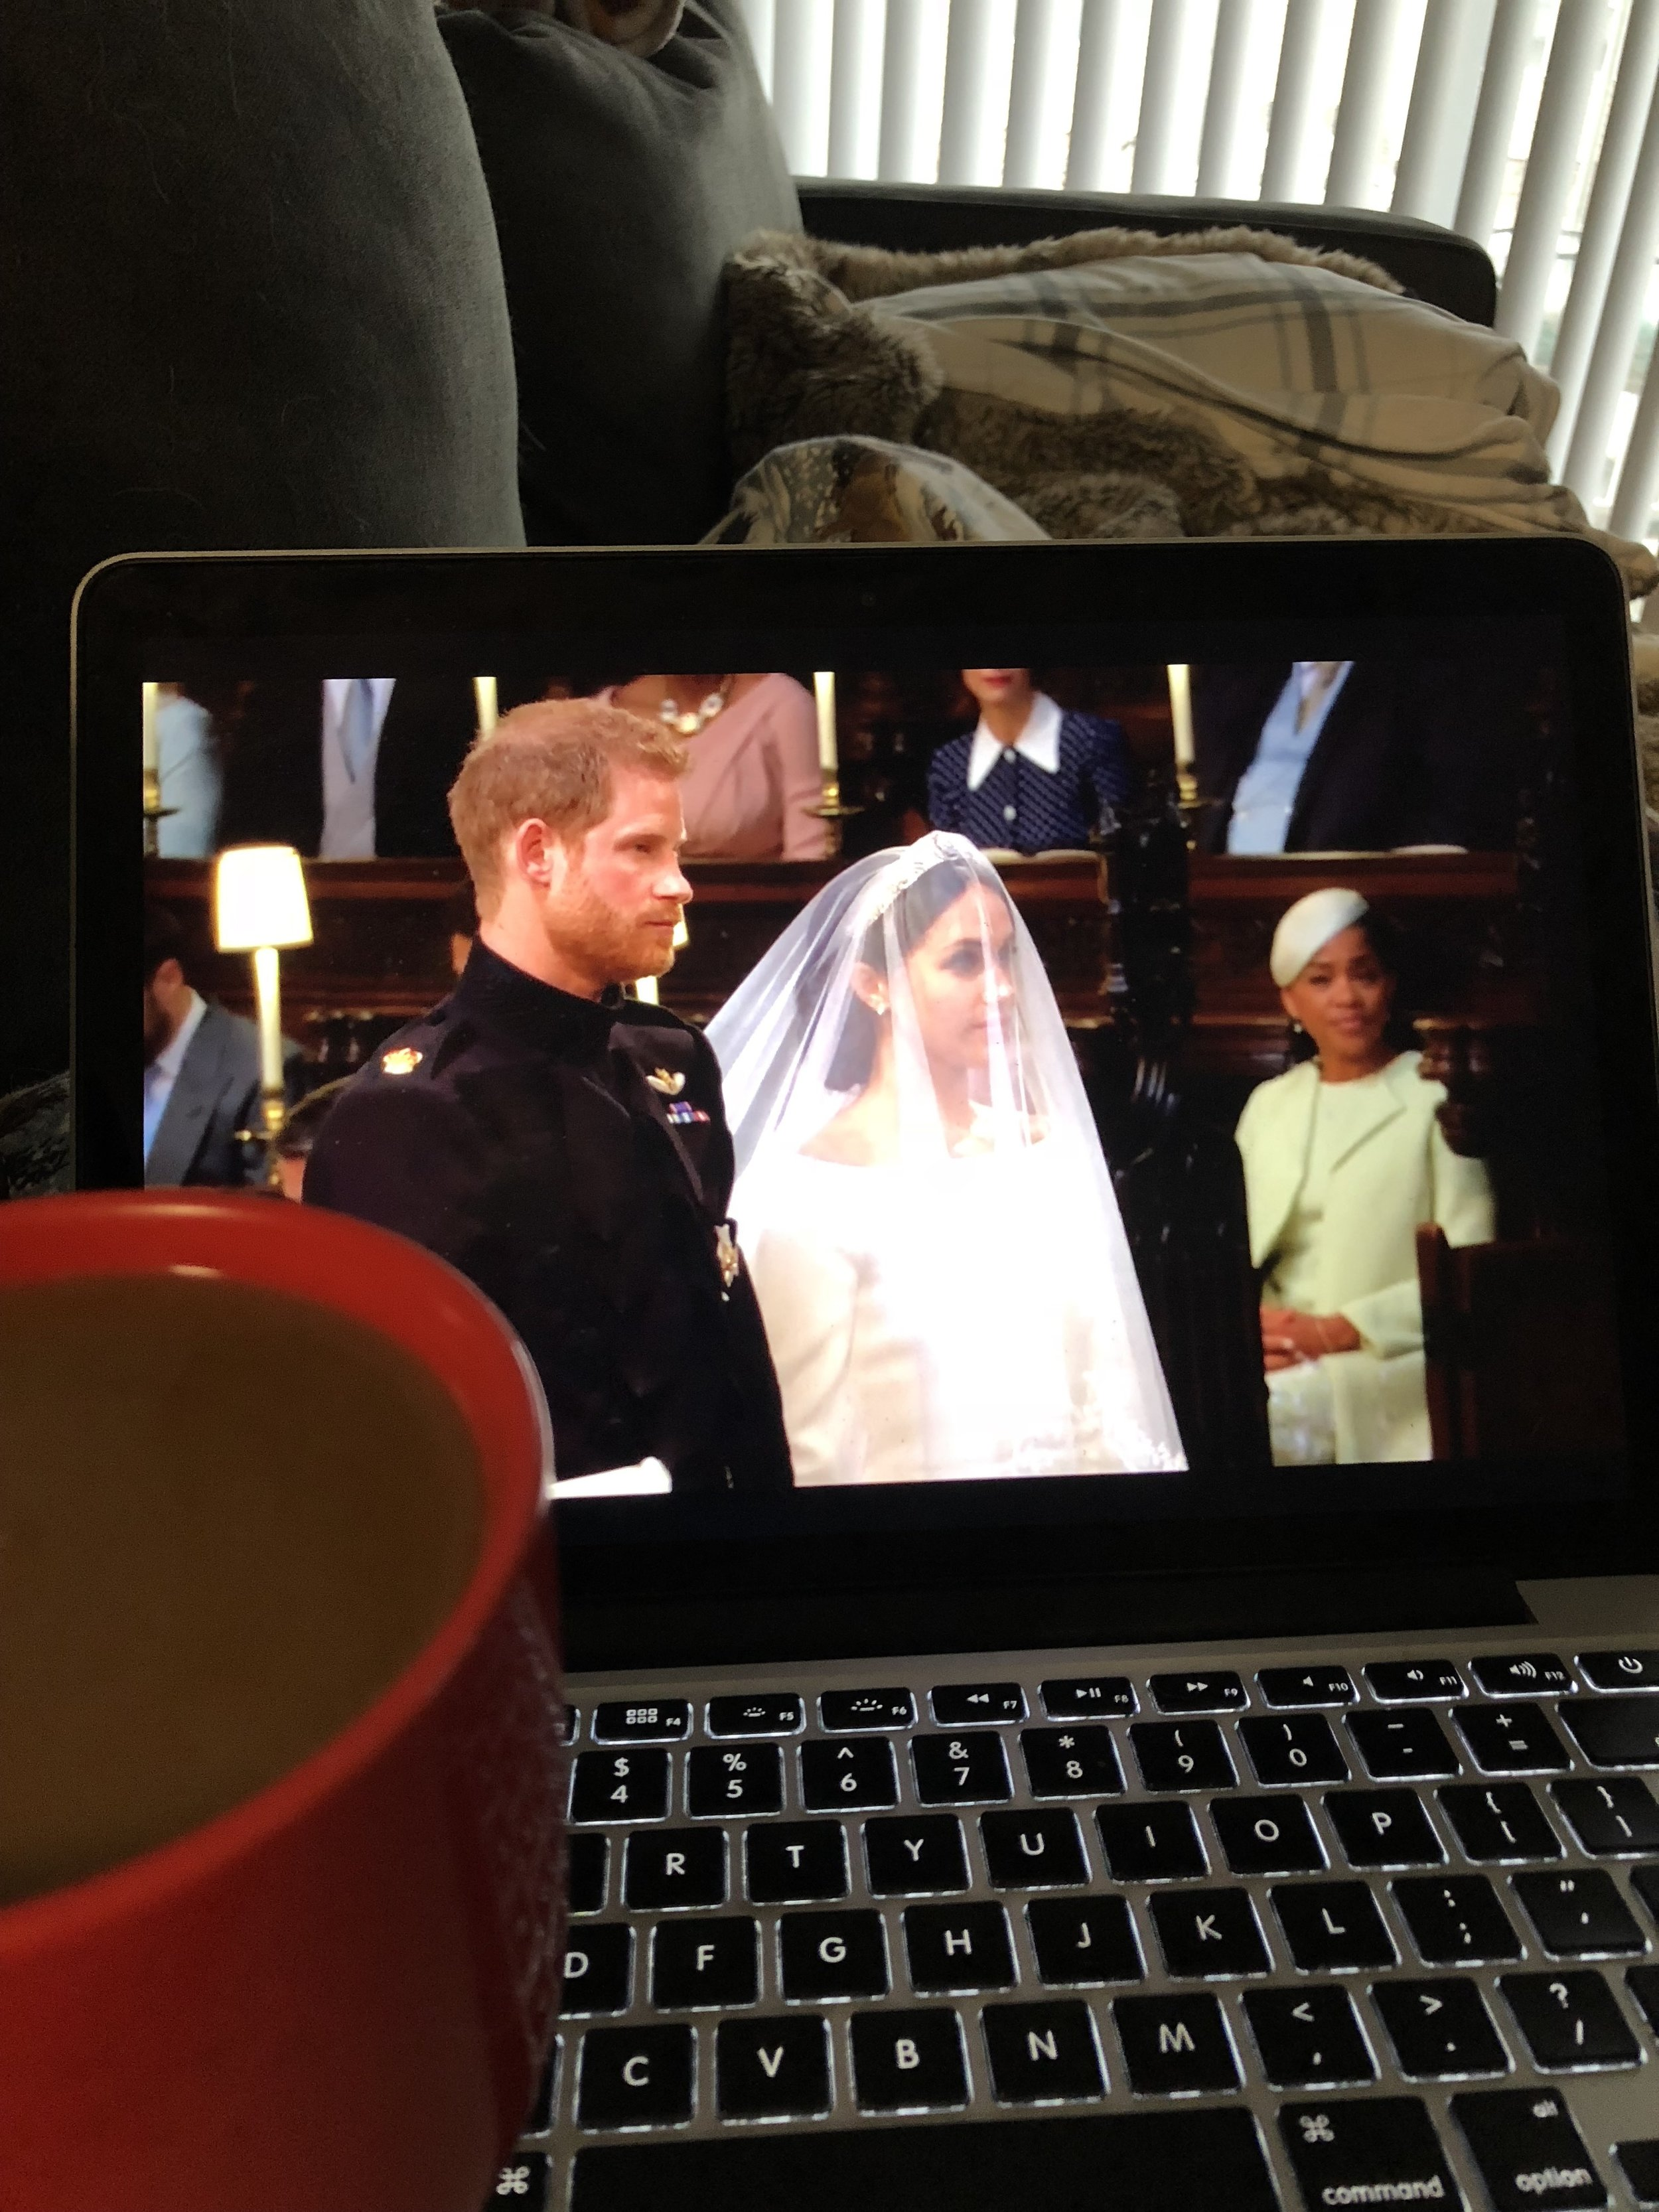 Saturday Morning Coffee #23 - Royal Wedding Edition